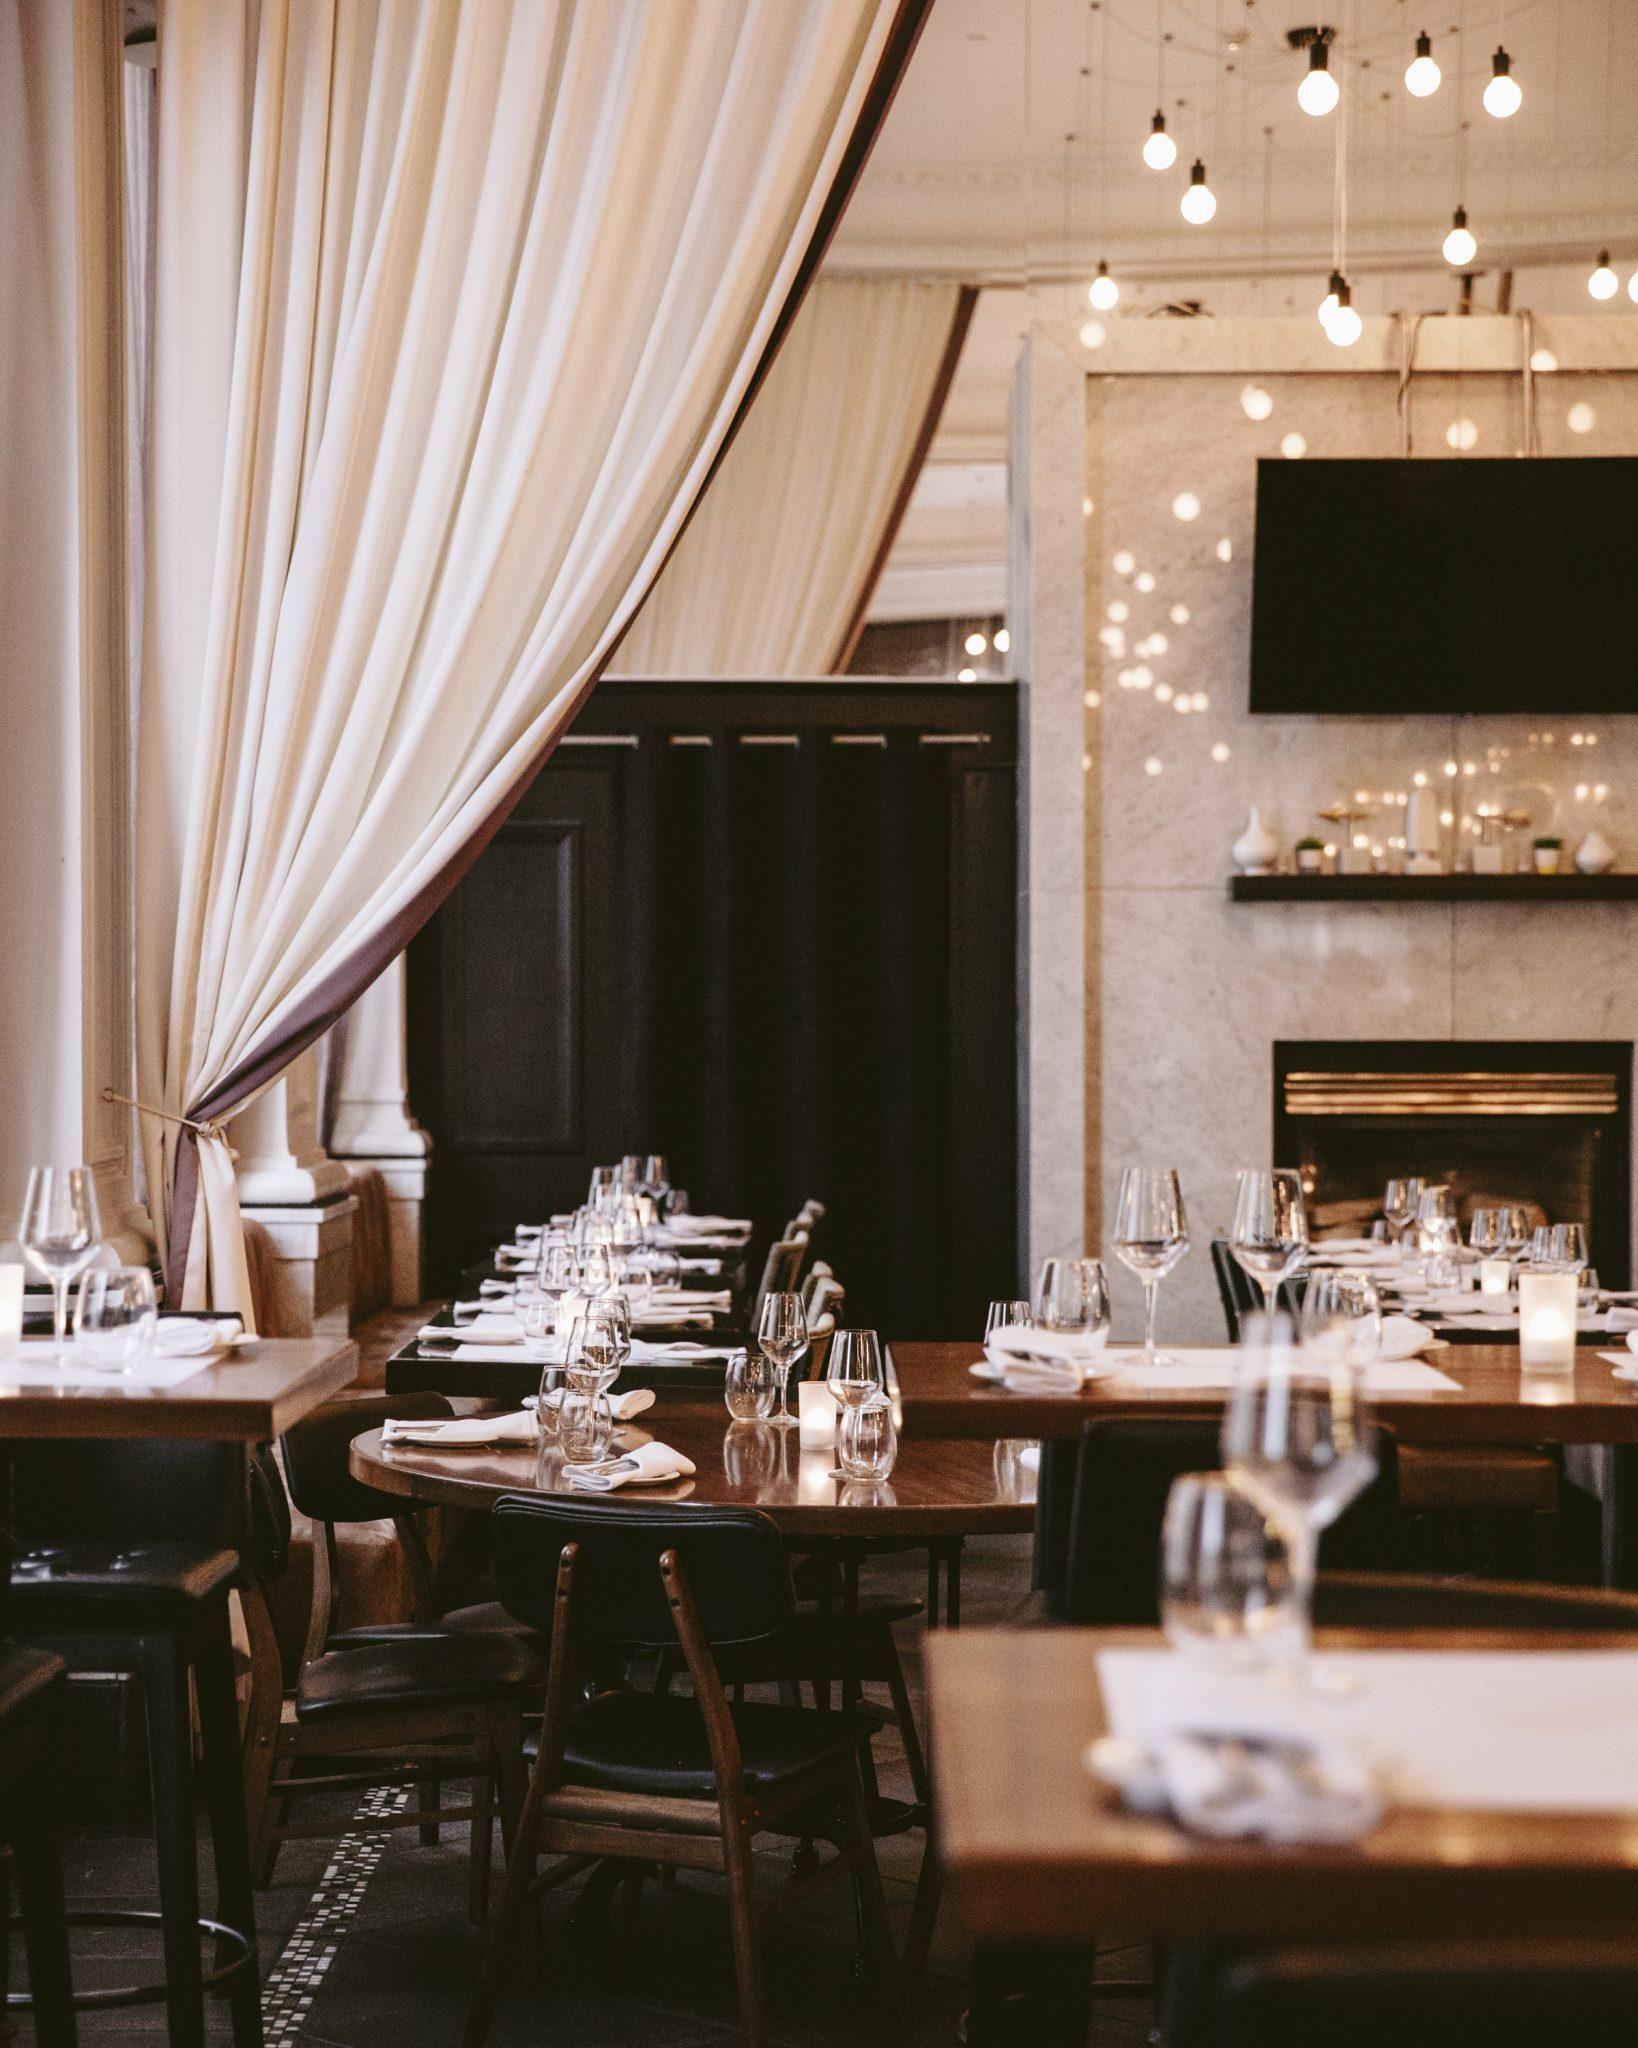 Brasserie 701 - restaurant of Hôtel Place d'Armes